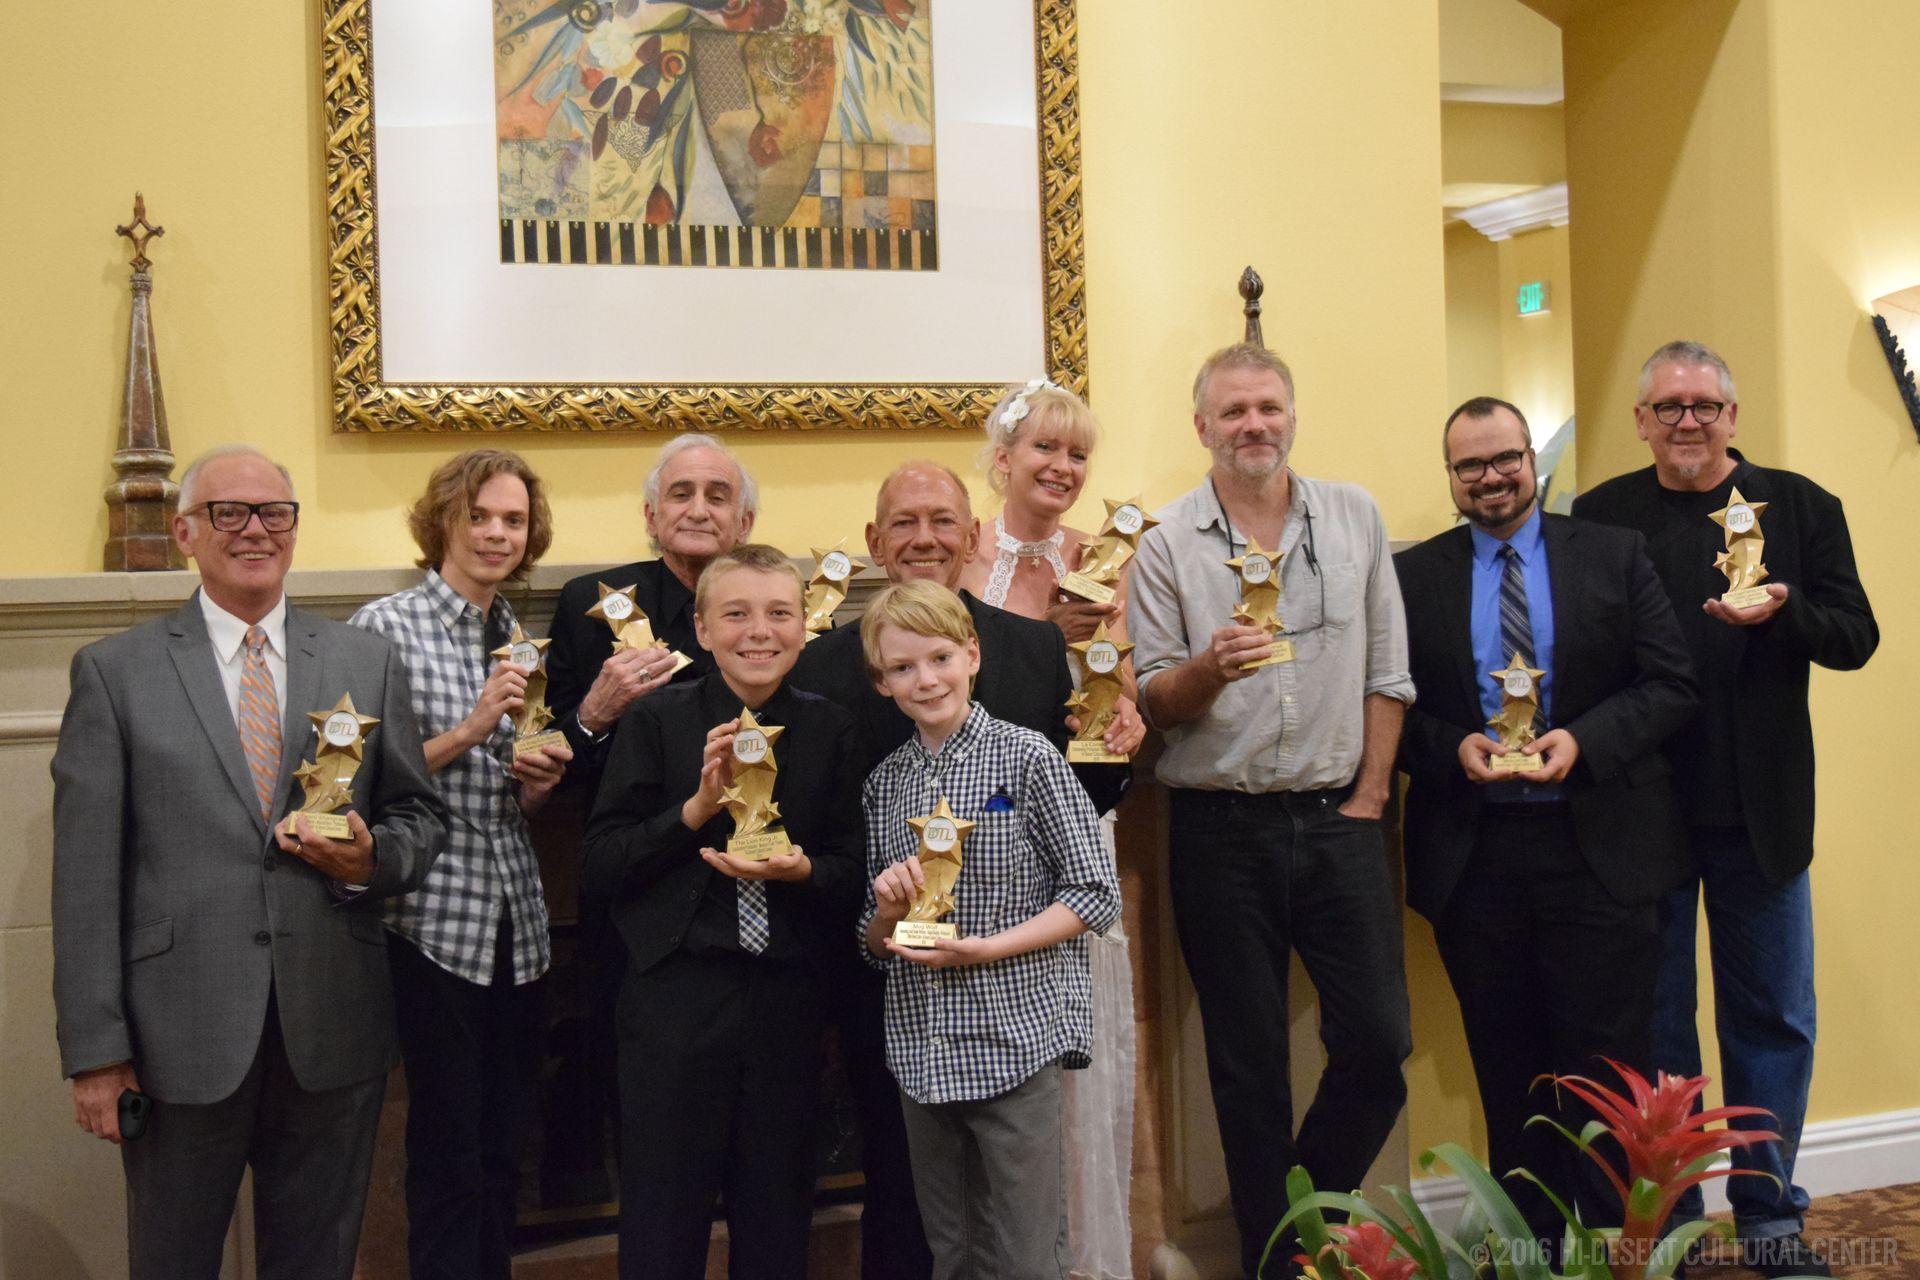 hdcc-dtl-awards-group-photo04